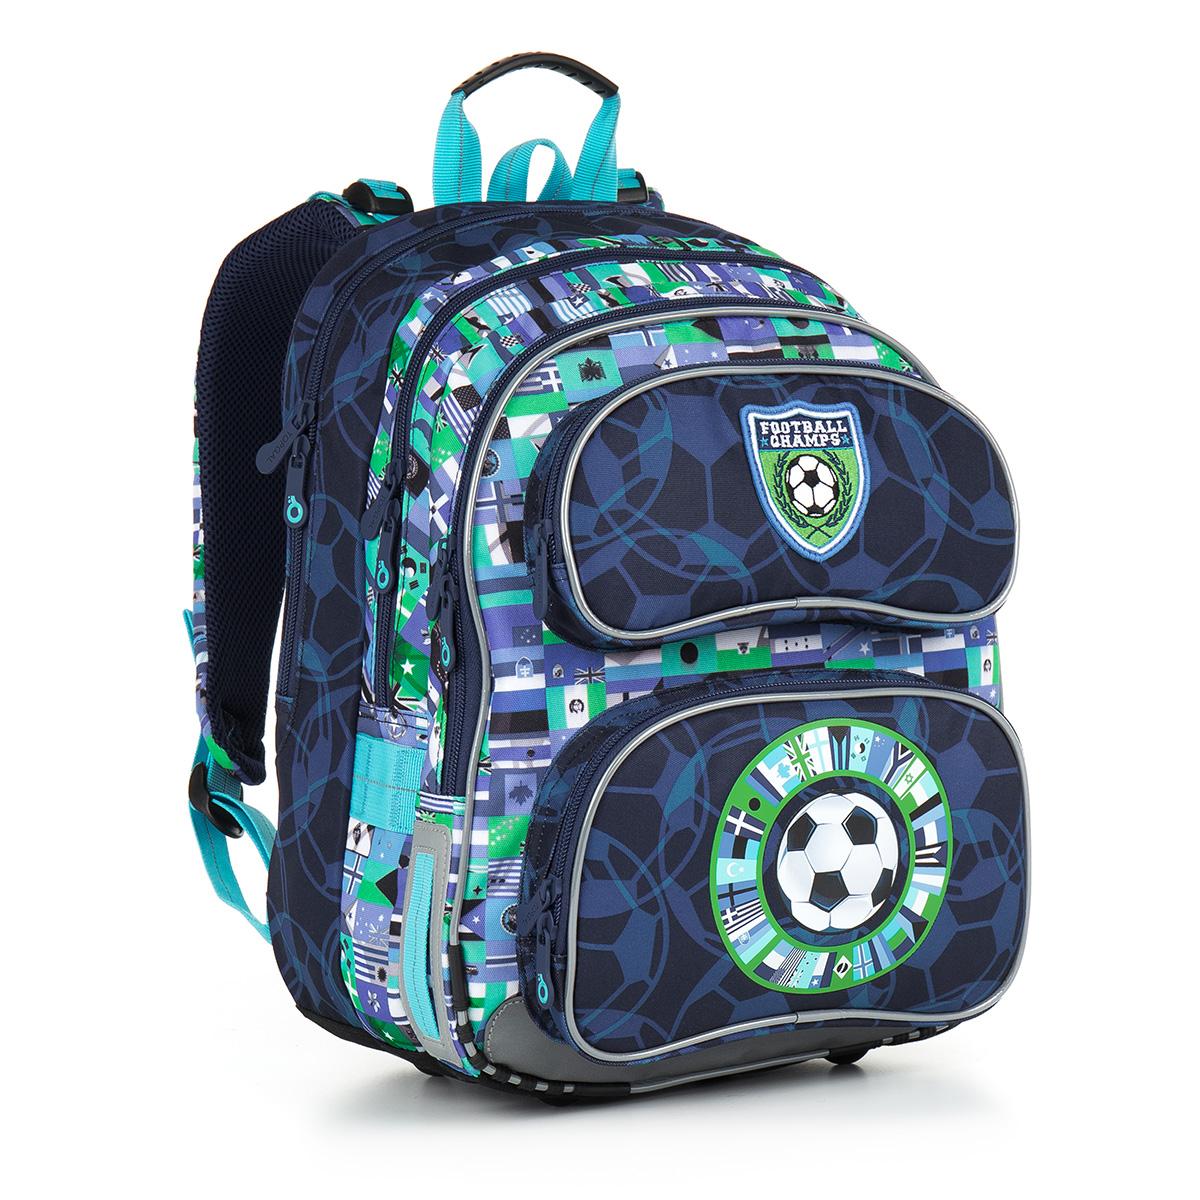 Školní batoh Topgal CHI 884 D - Blue